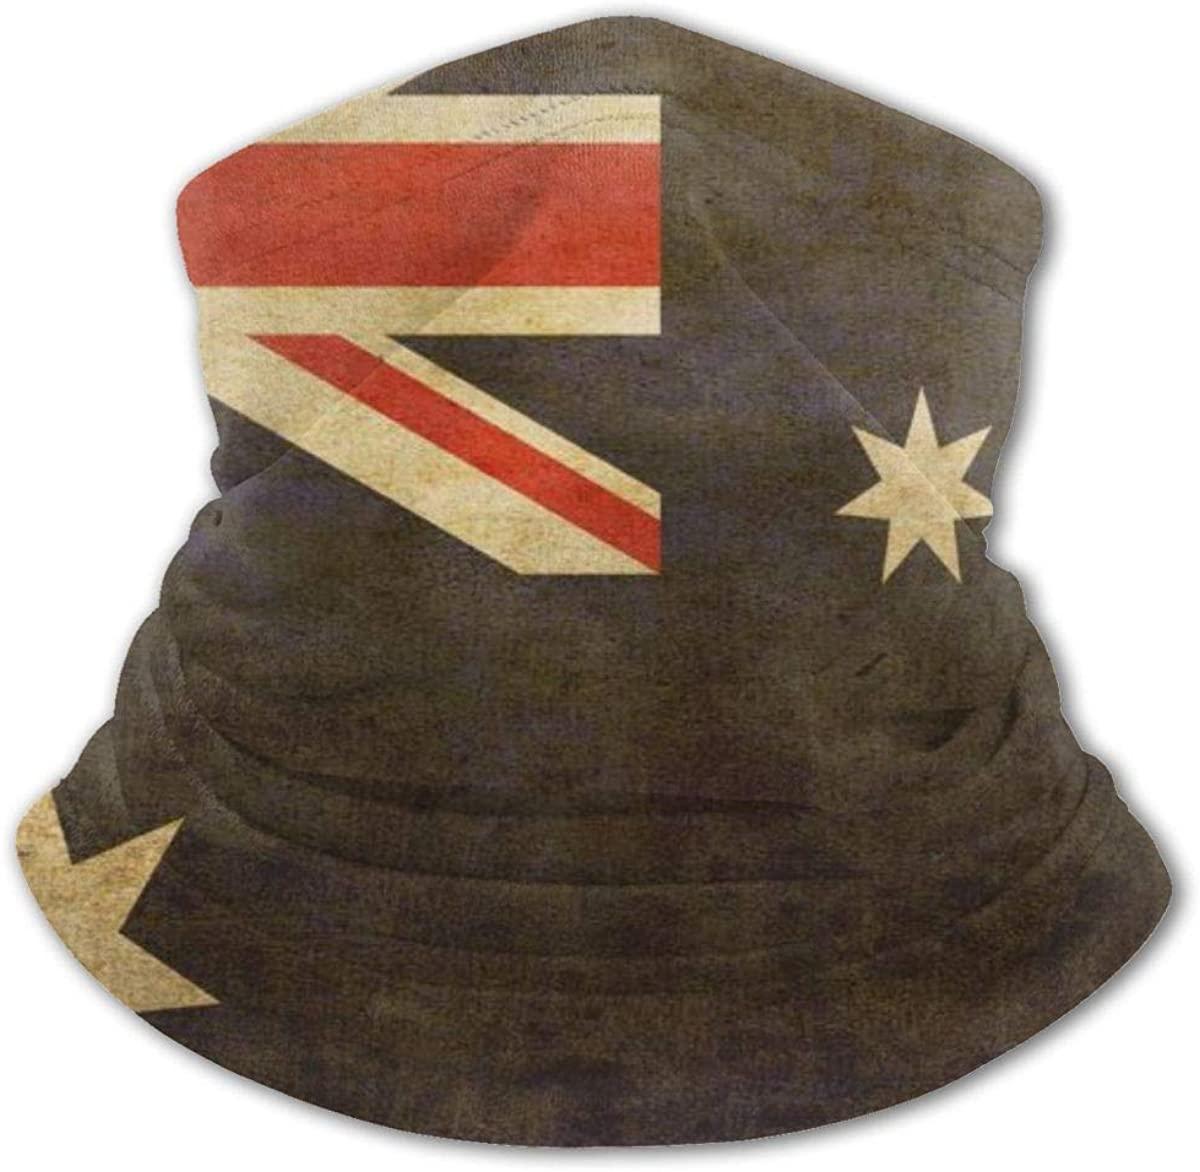 Australian Flag Headwear For Girls And Boys, Head Wrap, Neck Gaiter, Headband, Tenn Fishing Mask, Magic Scarf, Tube Mask, Face Bandana Mask For Camping Running Cycling